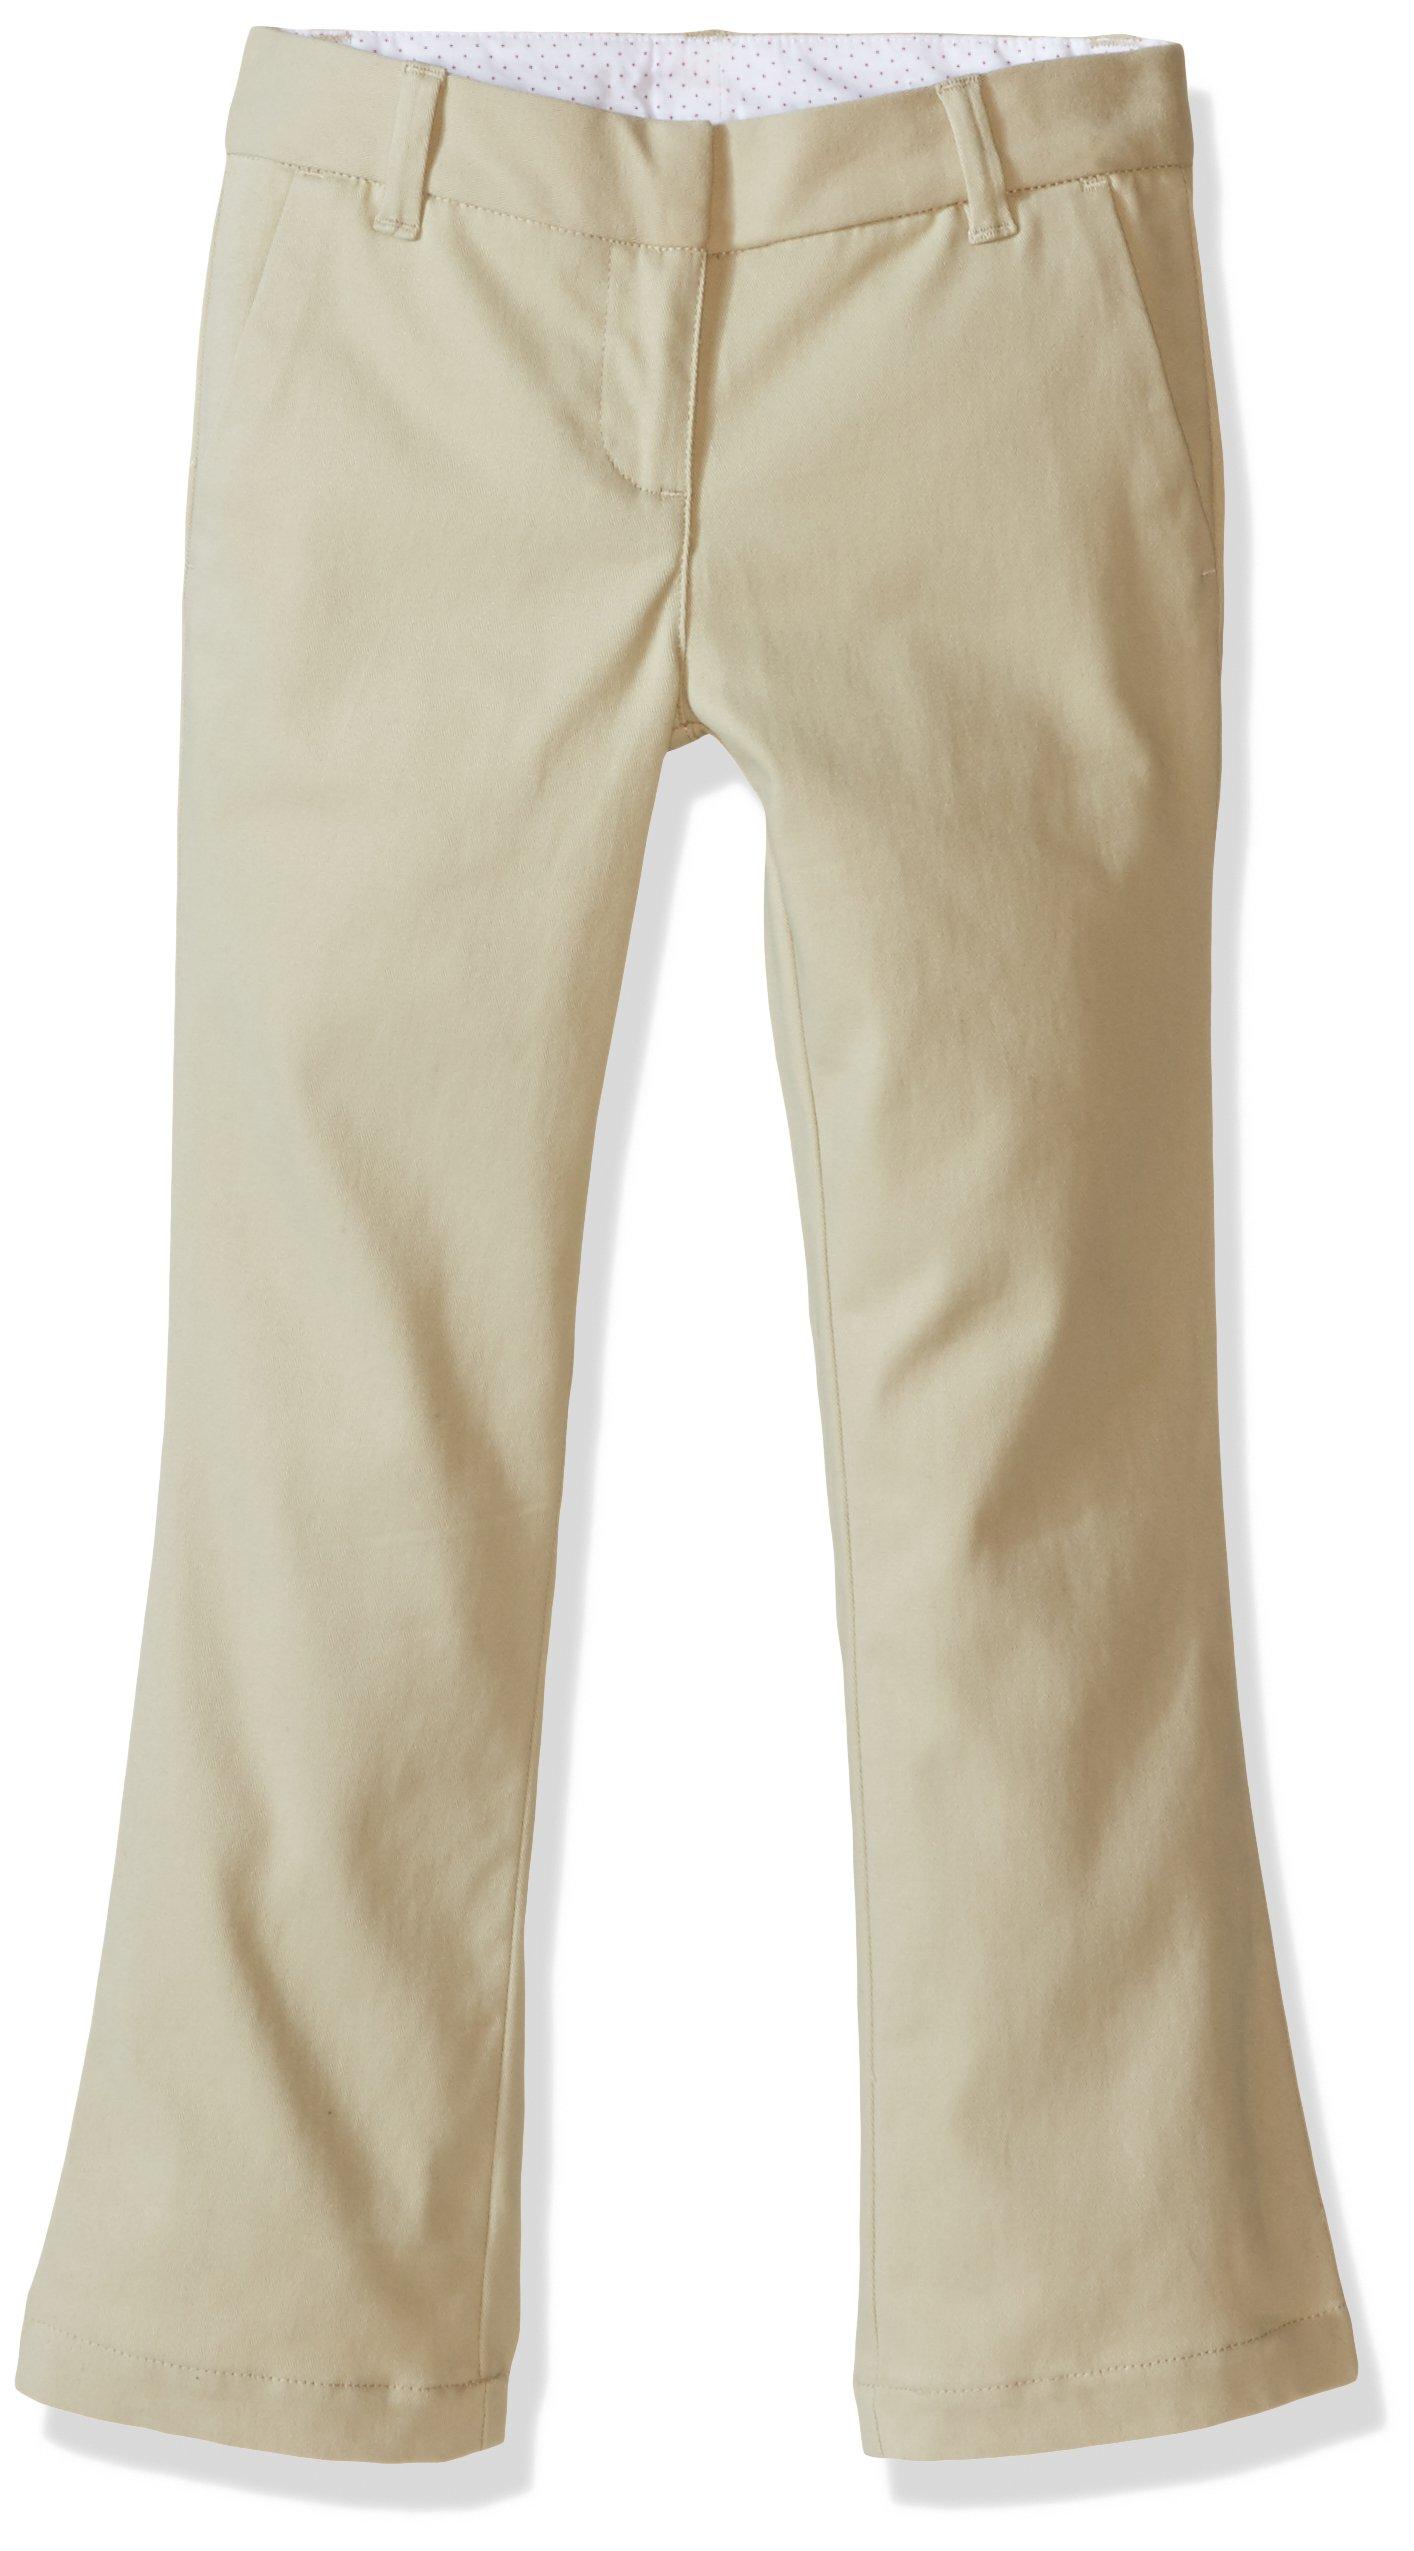 Dockers Plus Girls' Uniform Skinny Bootcut, Khaki, 18.5